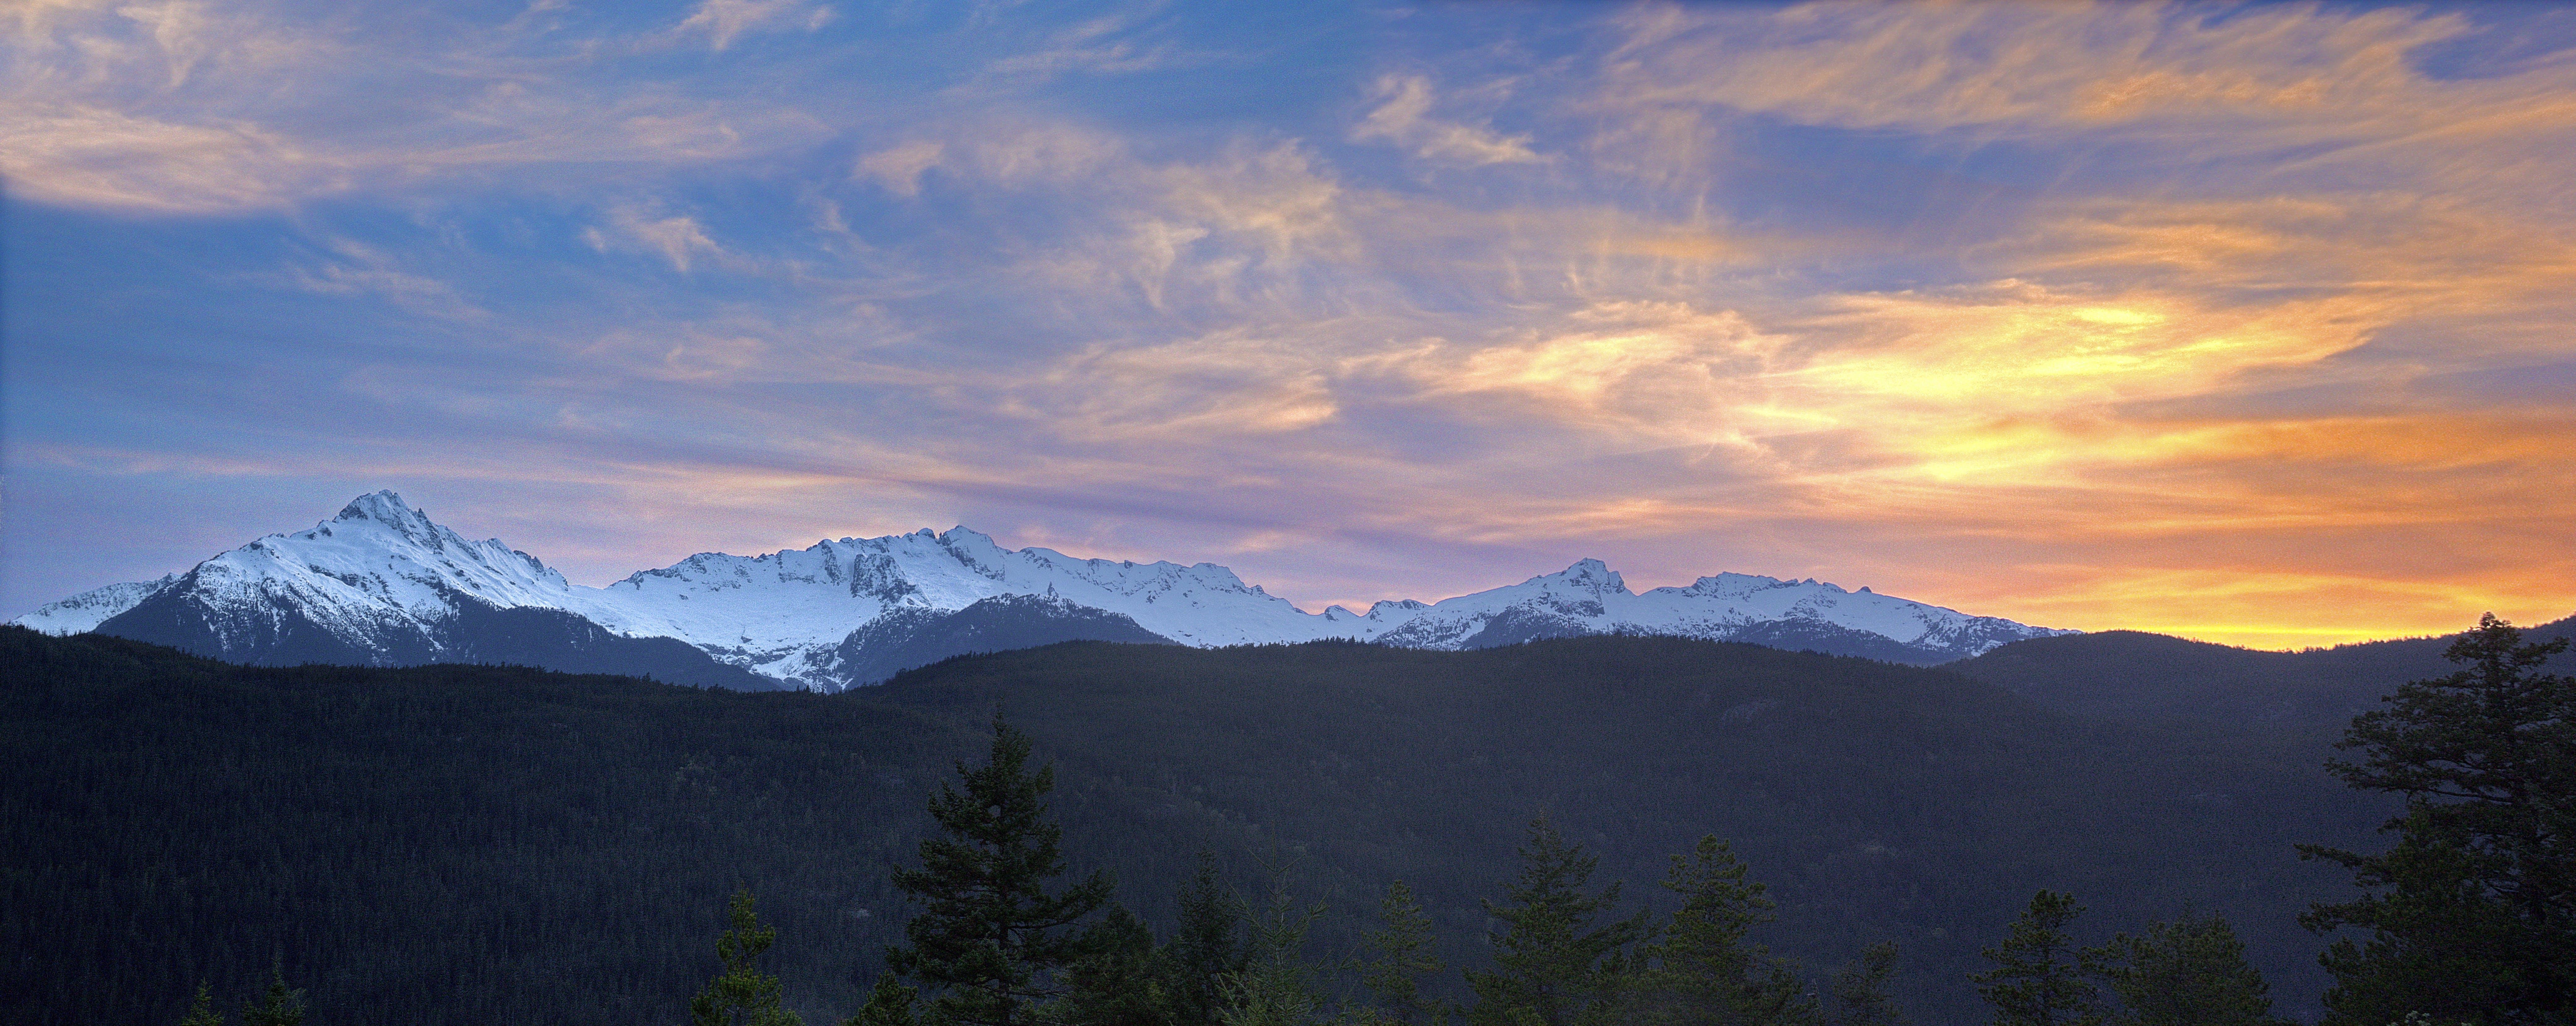 Snowcap Mountain Panorama